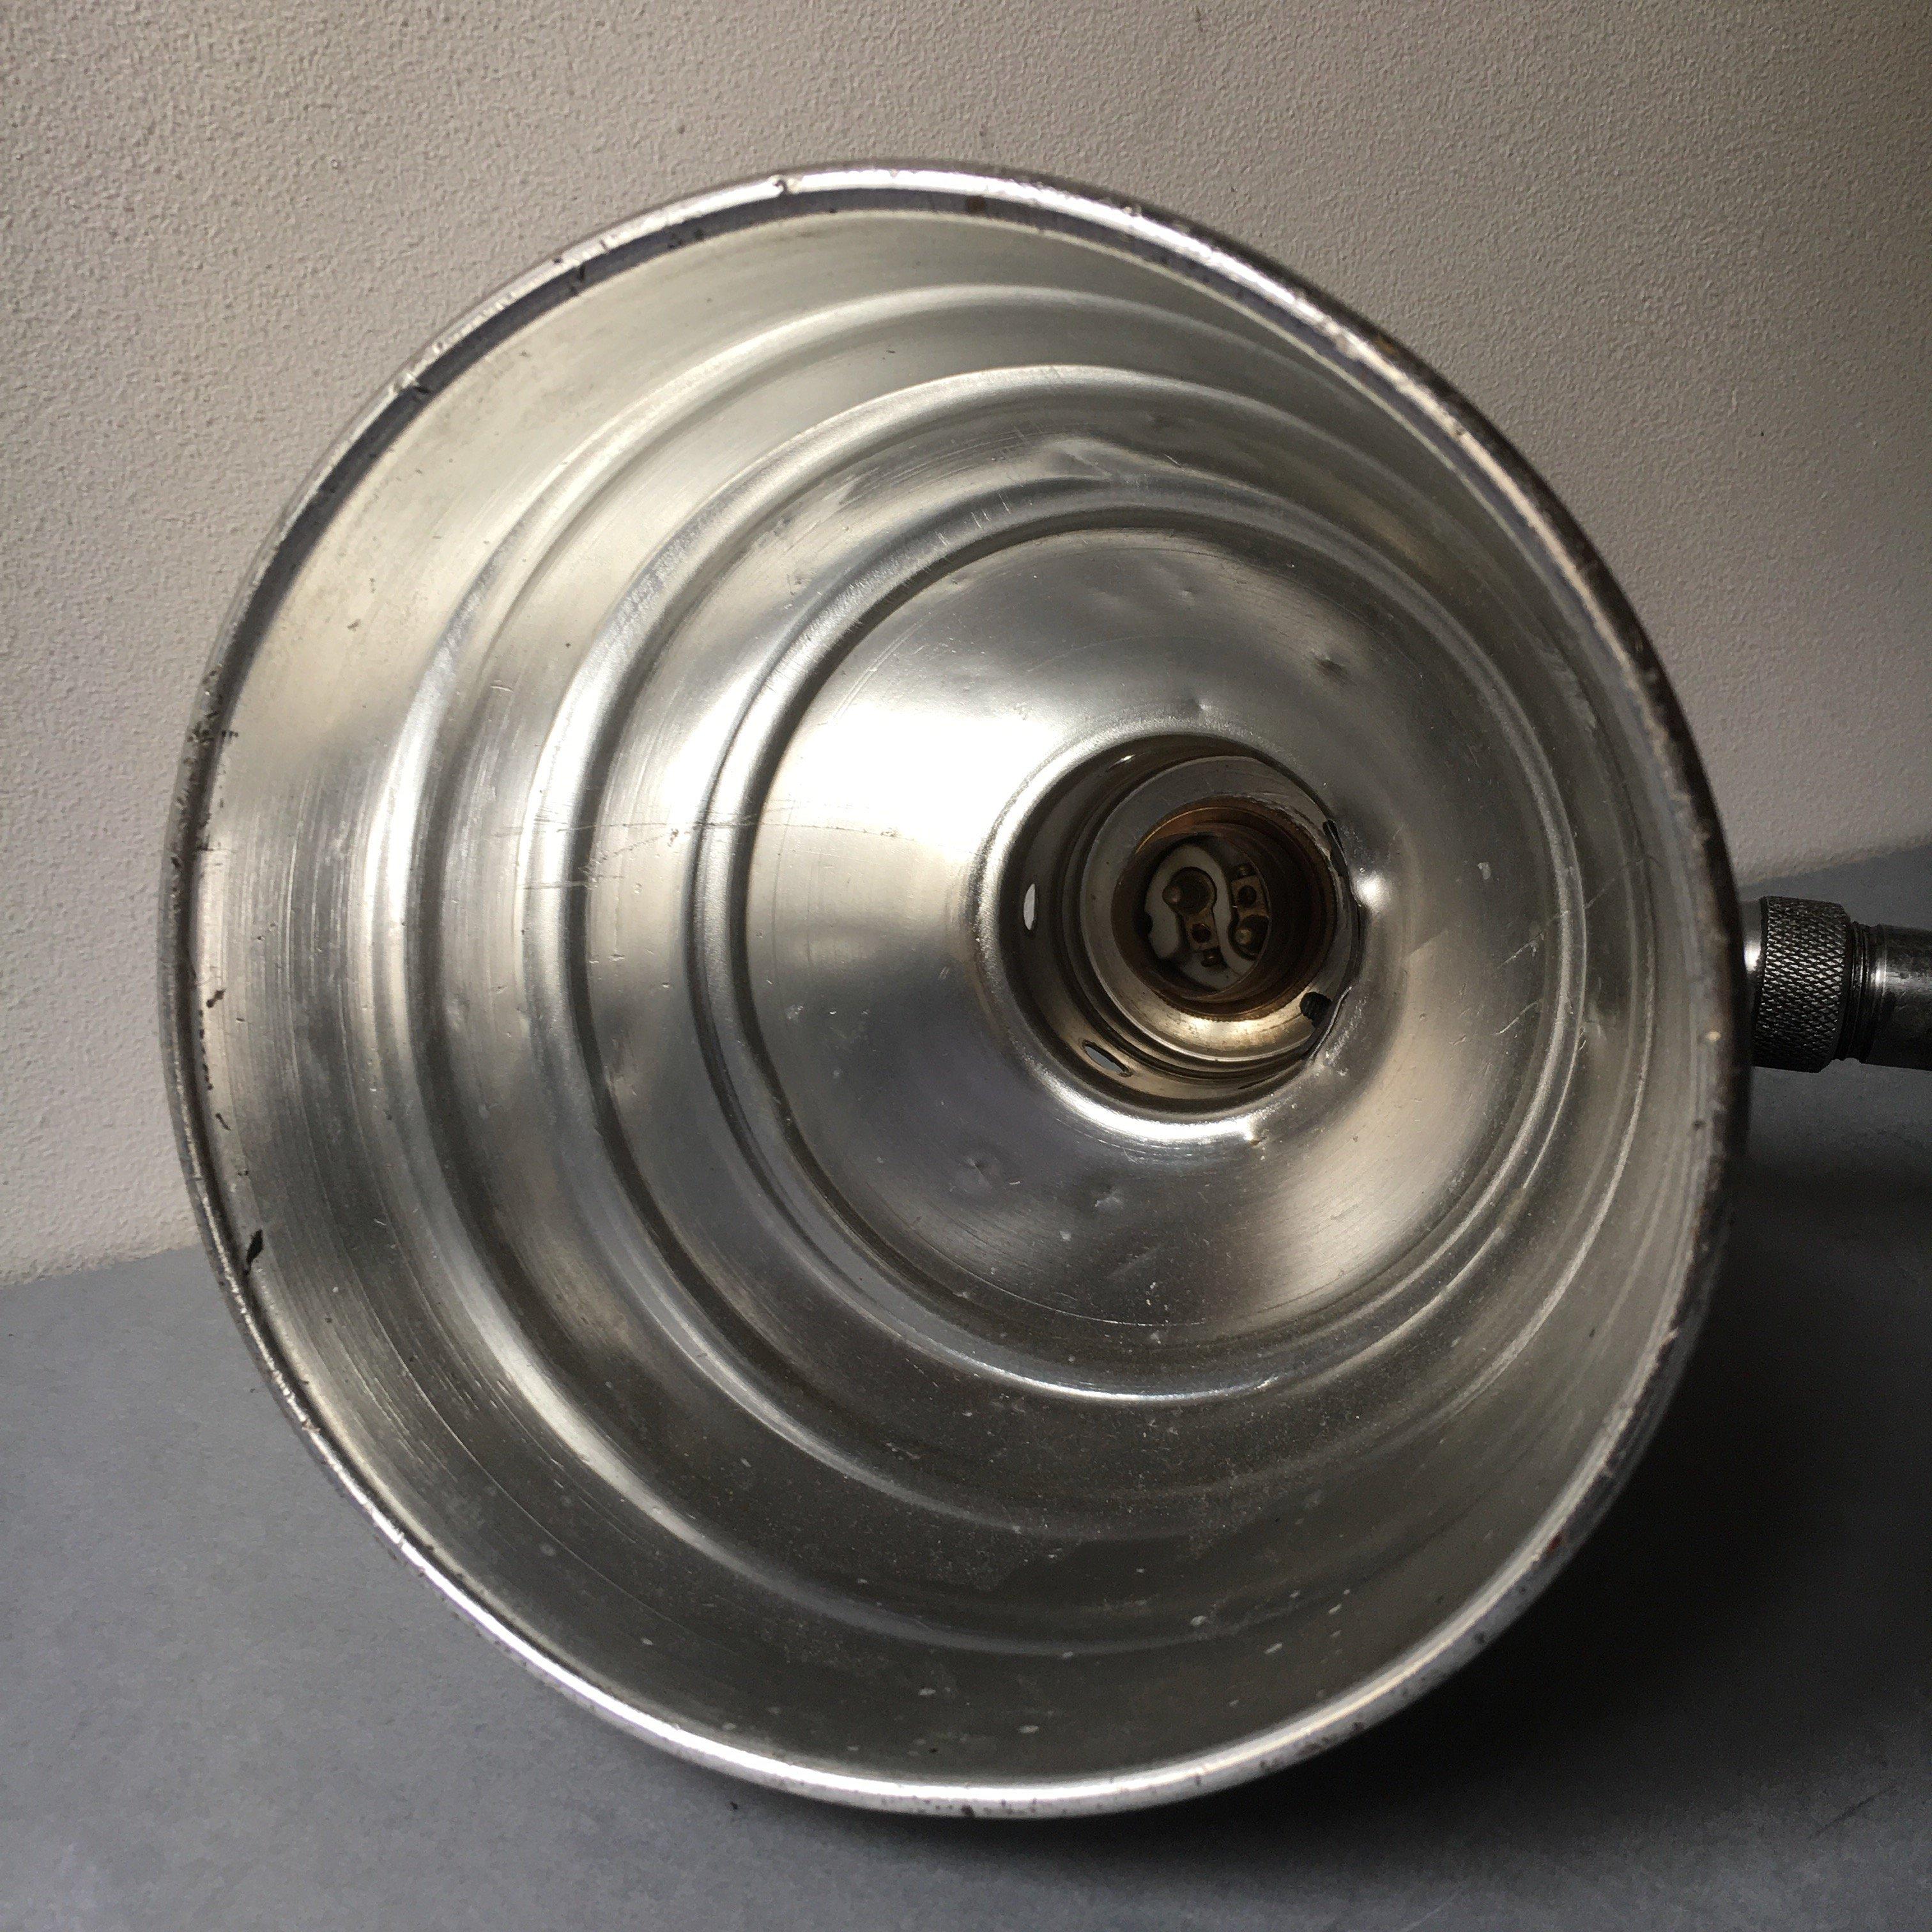 Solere contragewicht lamp 8